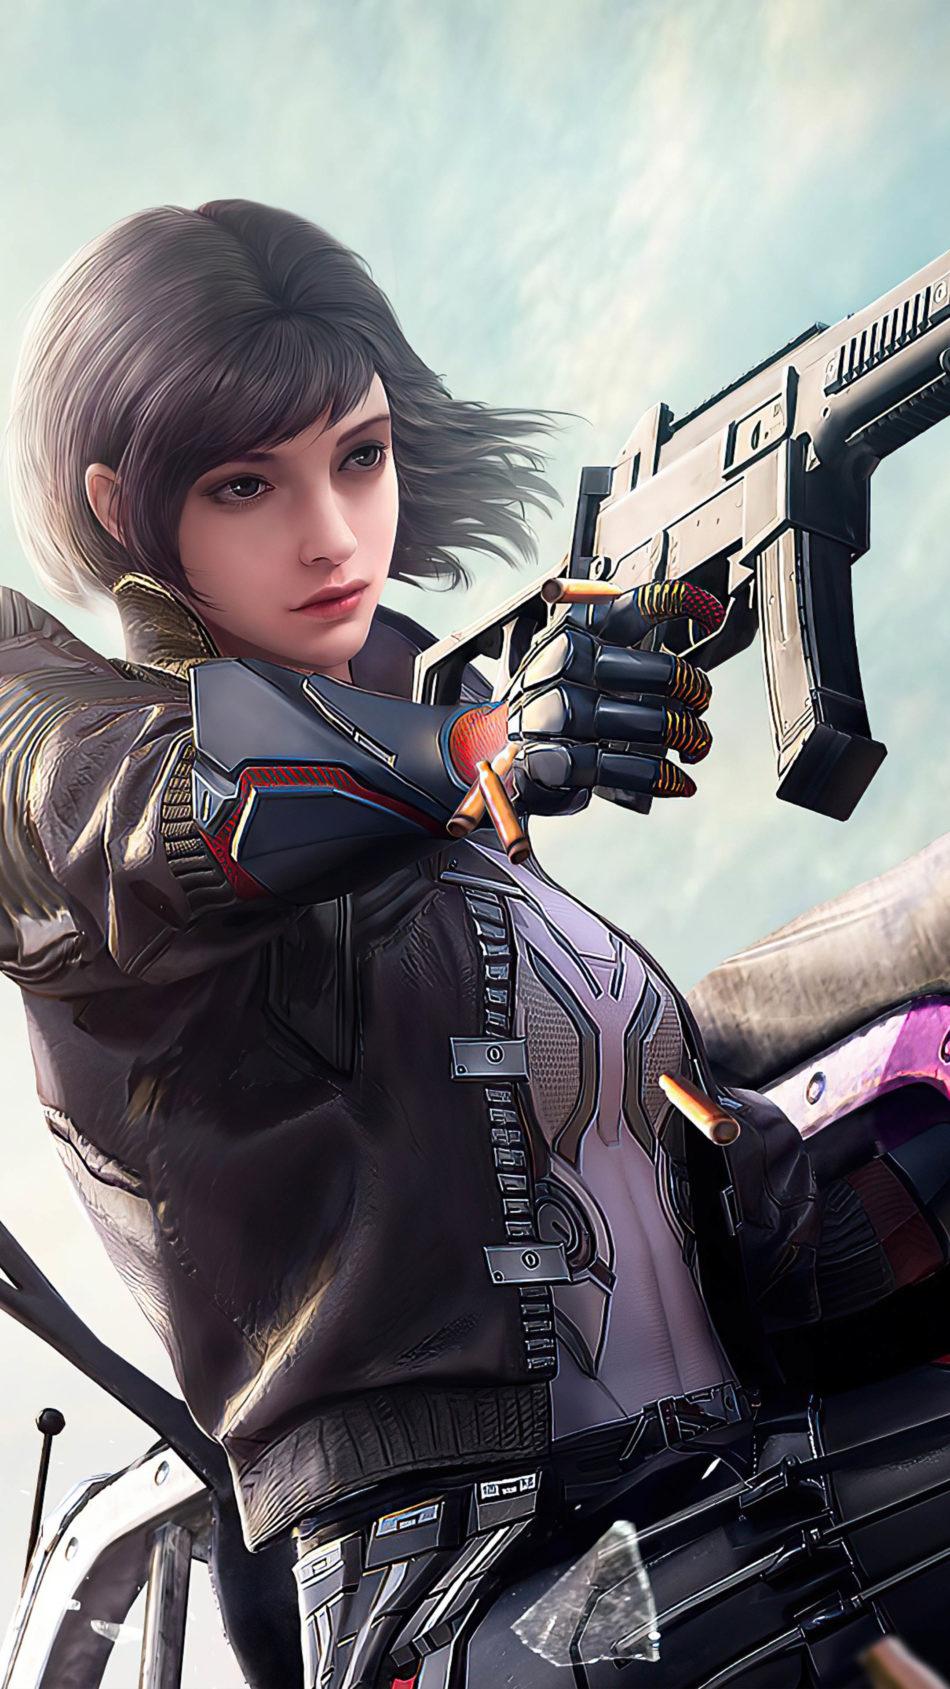 Cyberpunk Neon Girl 4k, HD Games, 4k Wallpapers, Images